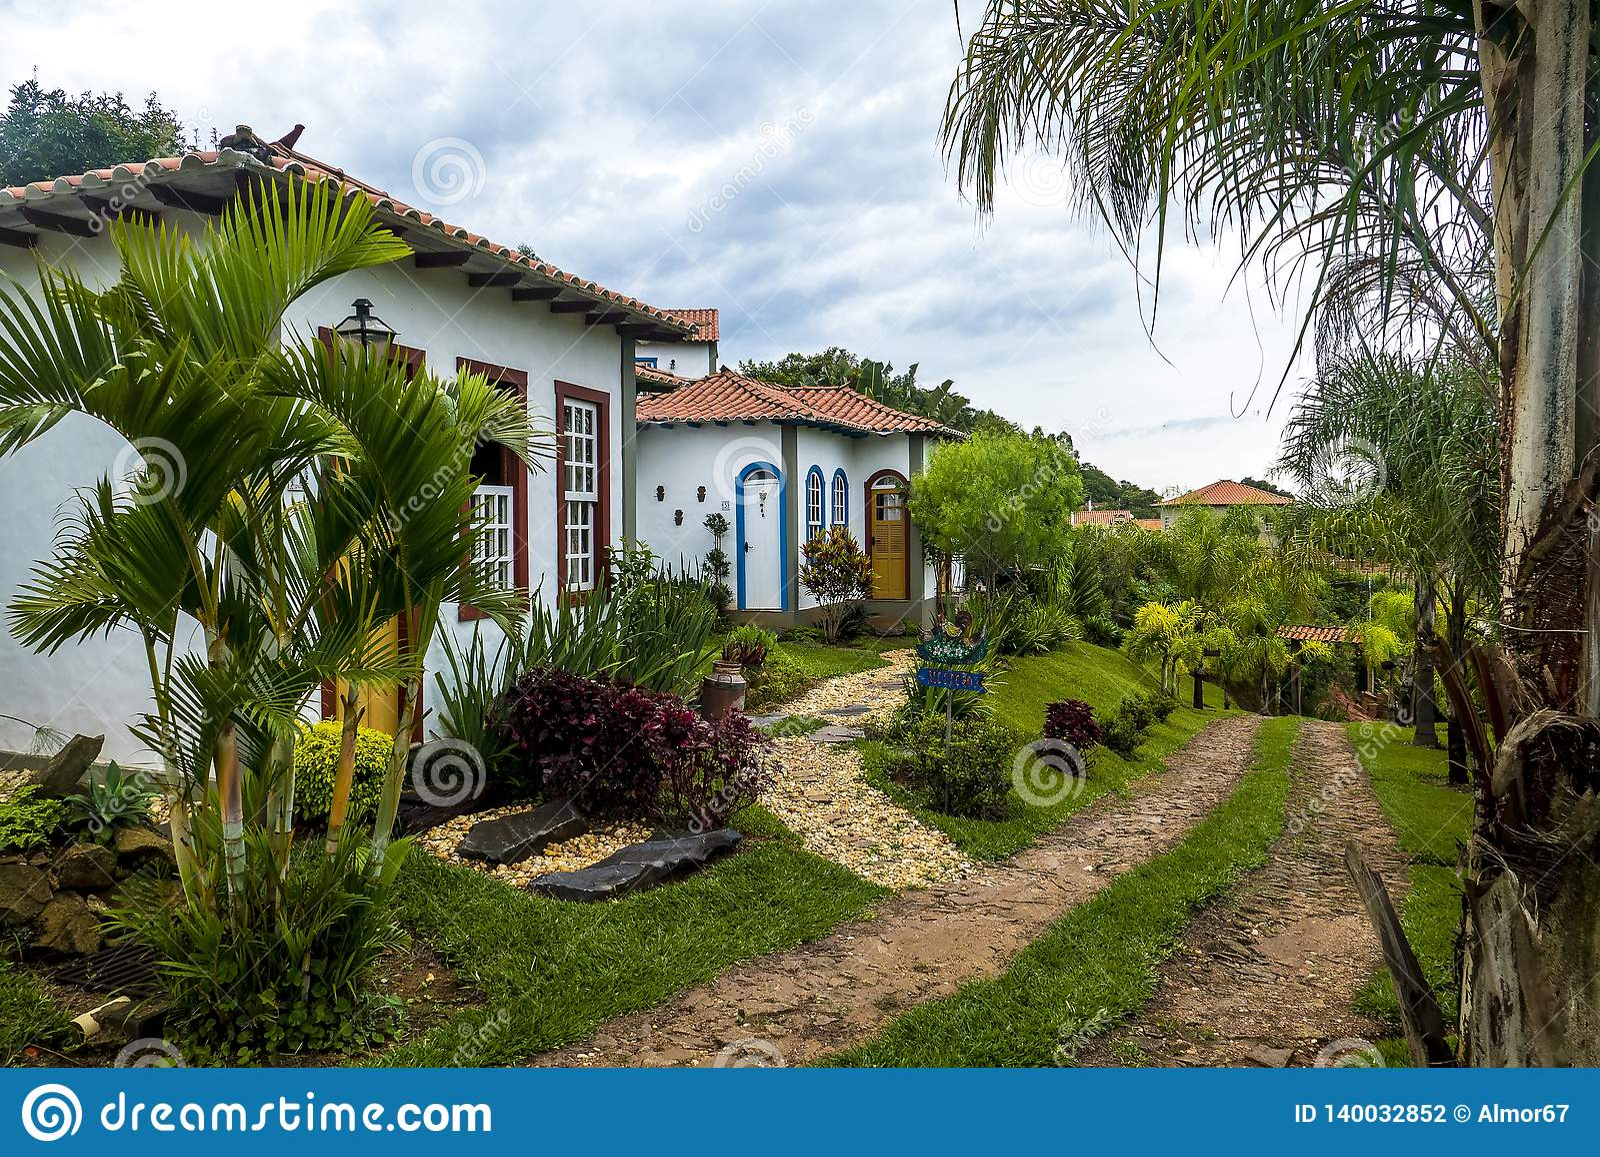 Tiradentes旅舍环境美化